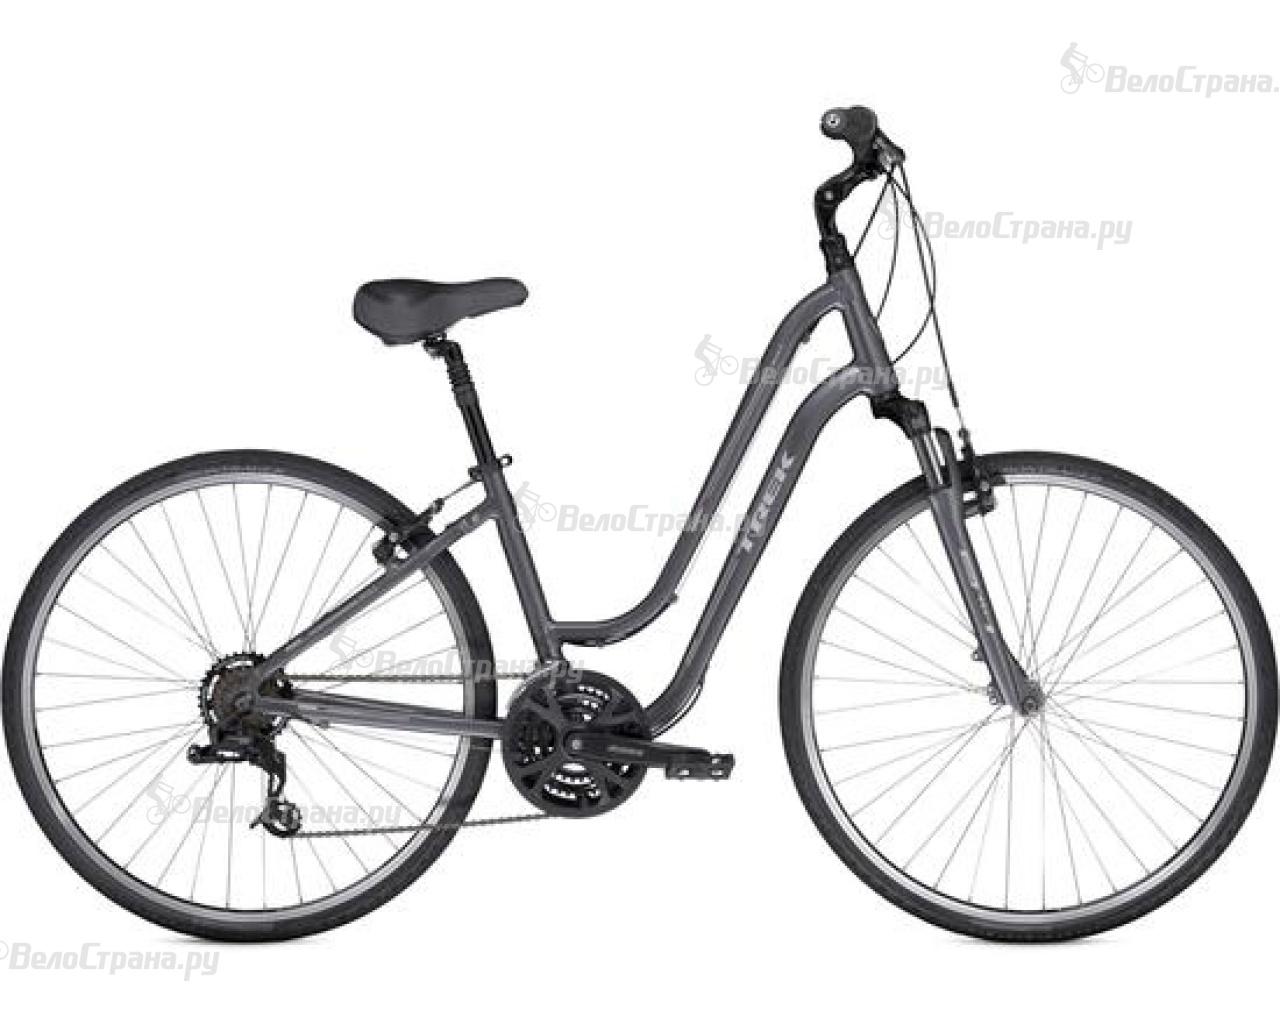 Велосипед Trek Verve 2 WSD (2013) велосипед trek madone 5 2 wsd 2013